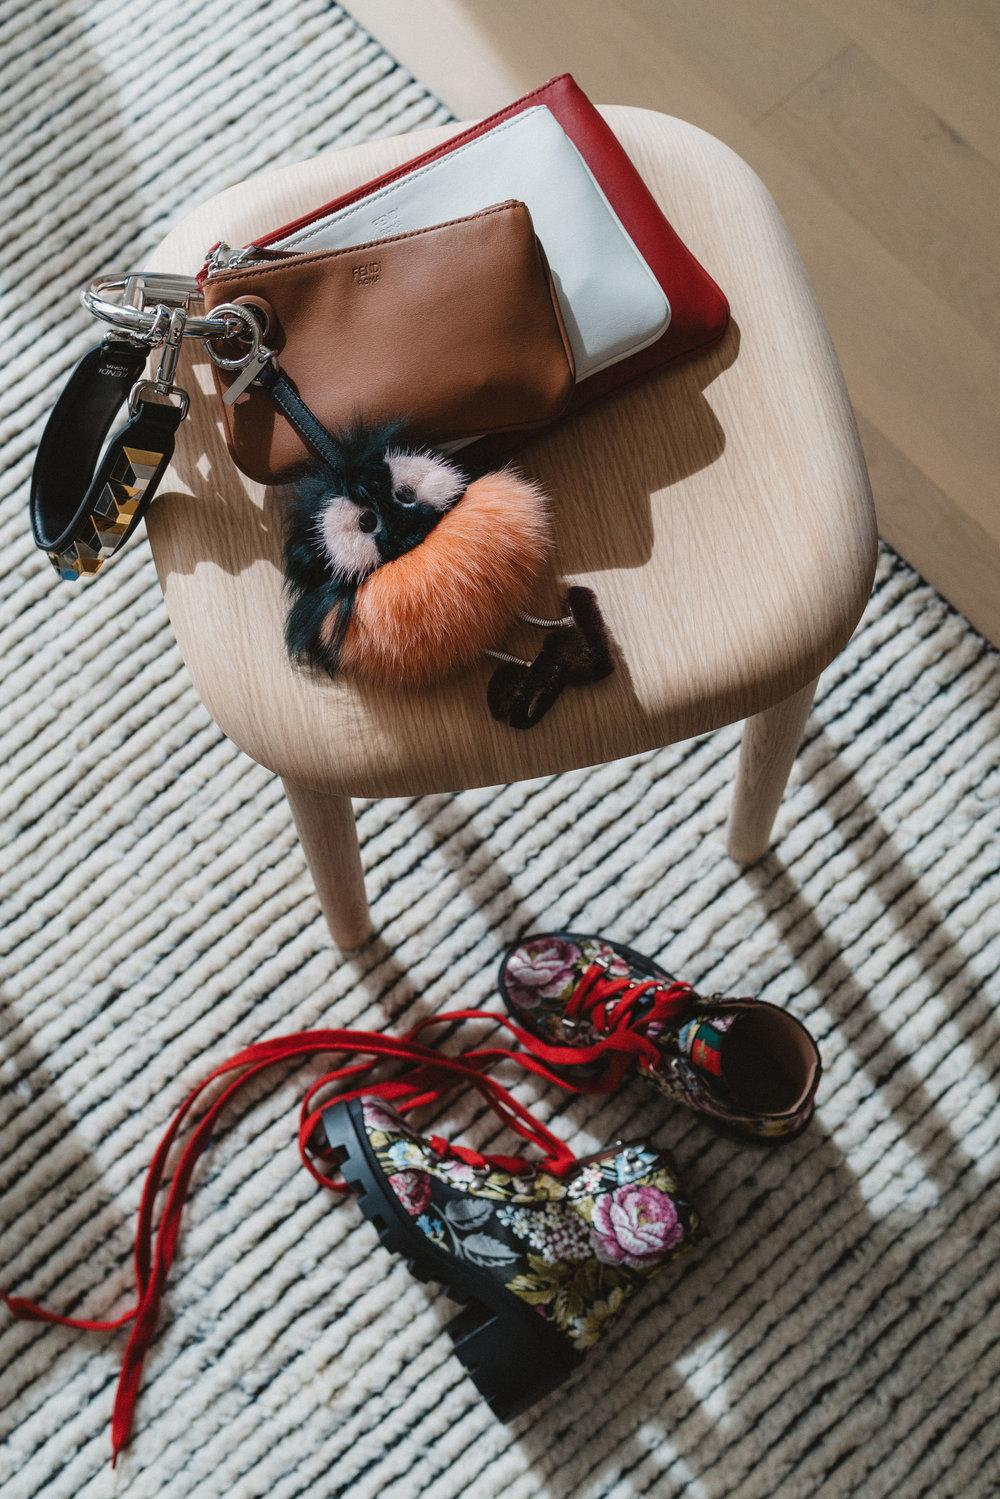 Fendi Pouch, Fendi Keychain, Gucci Boots